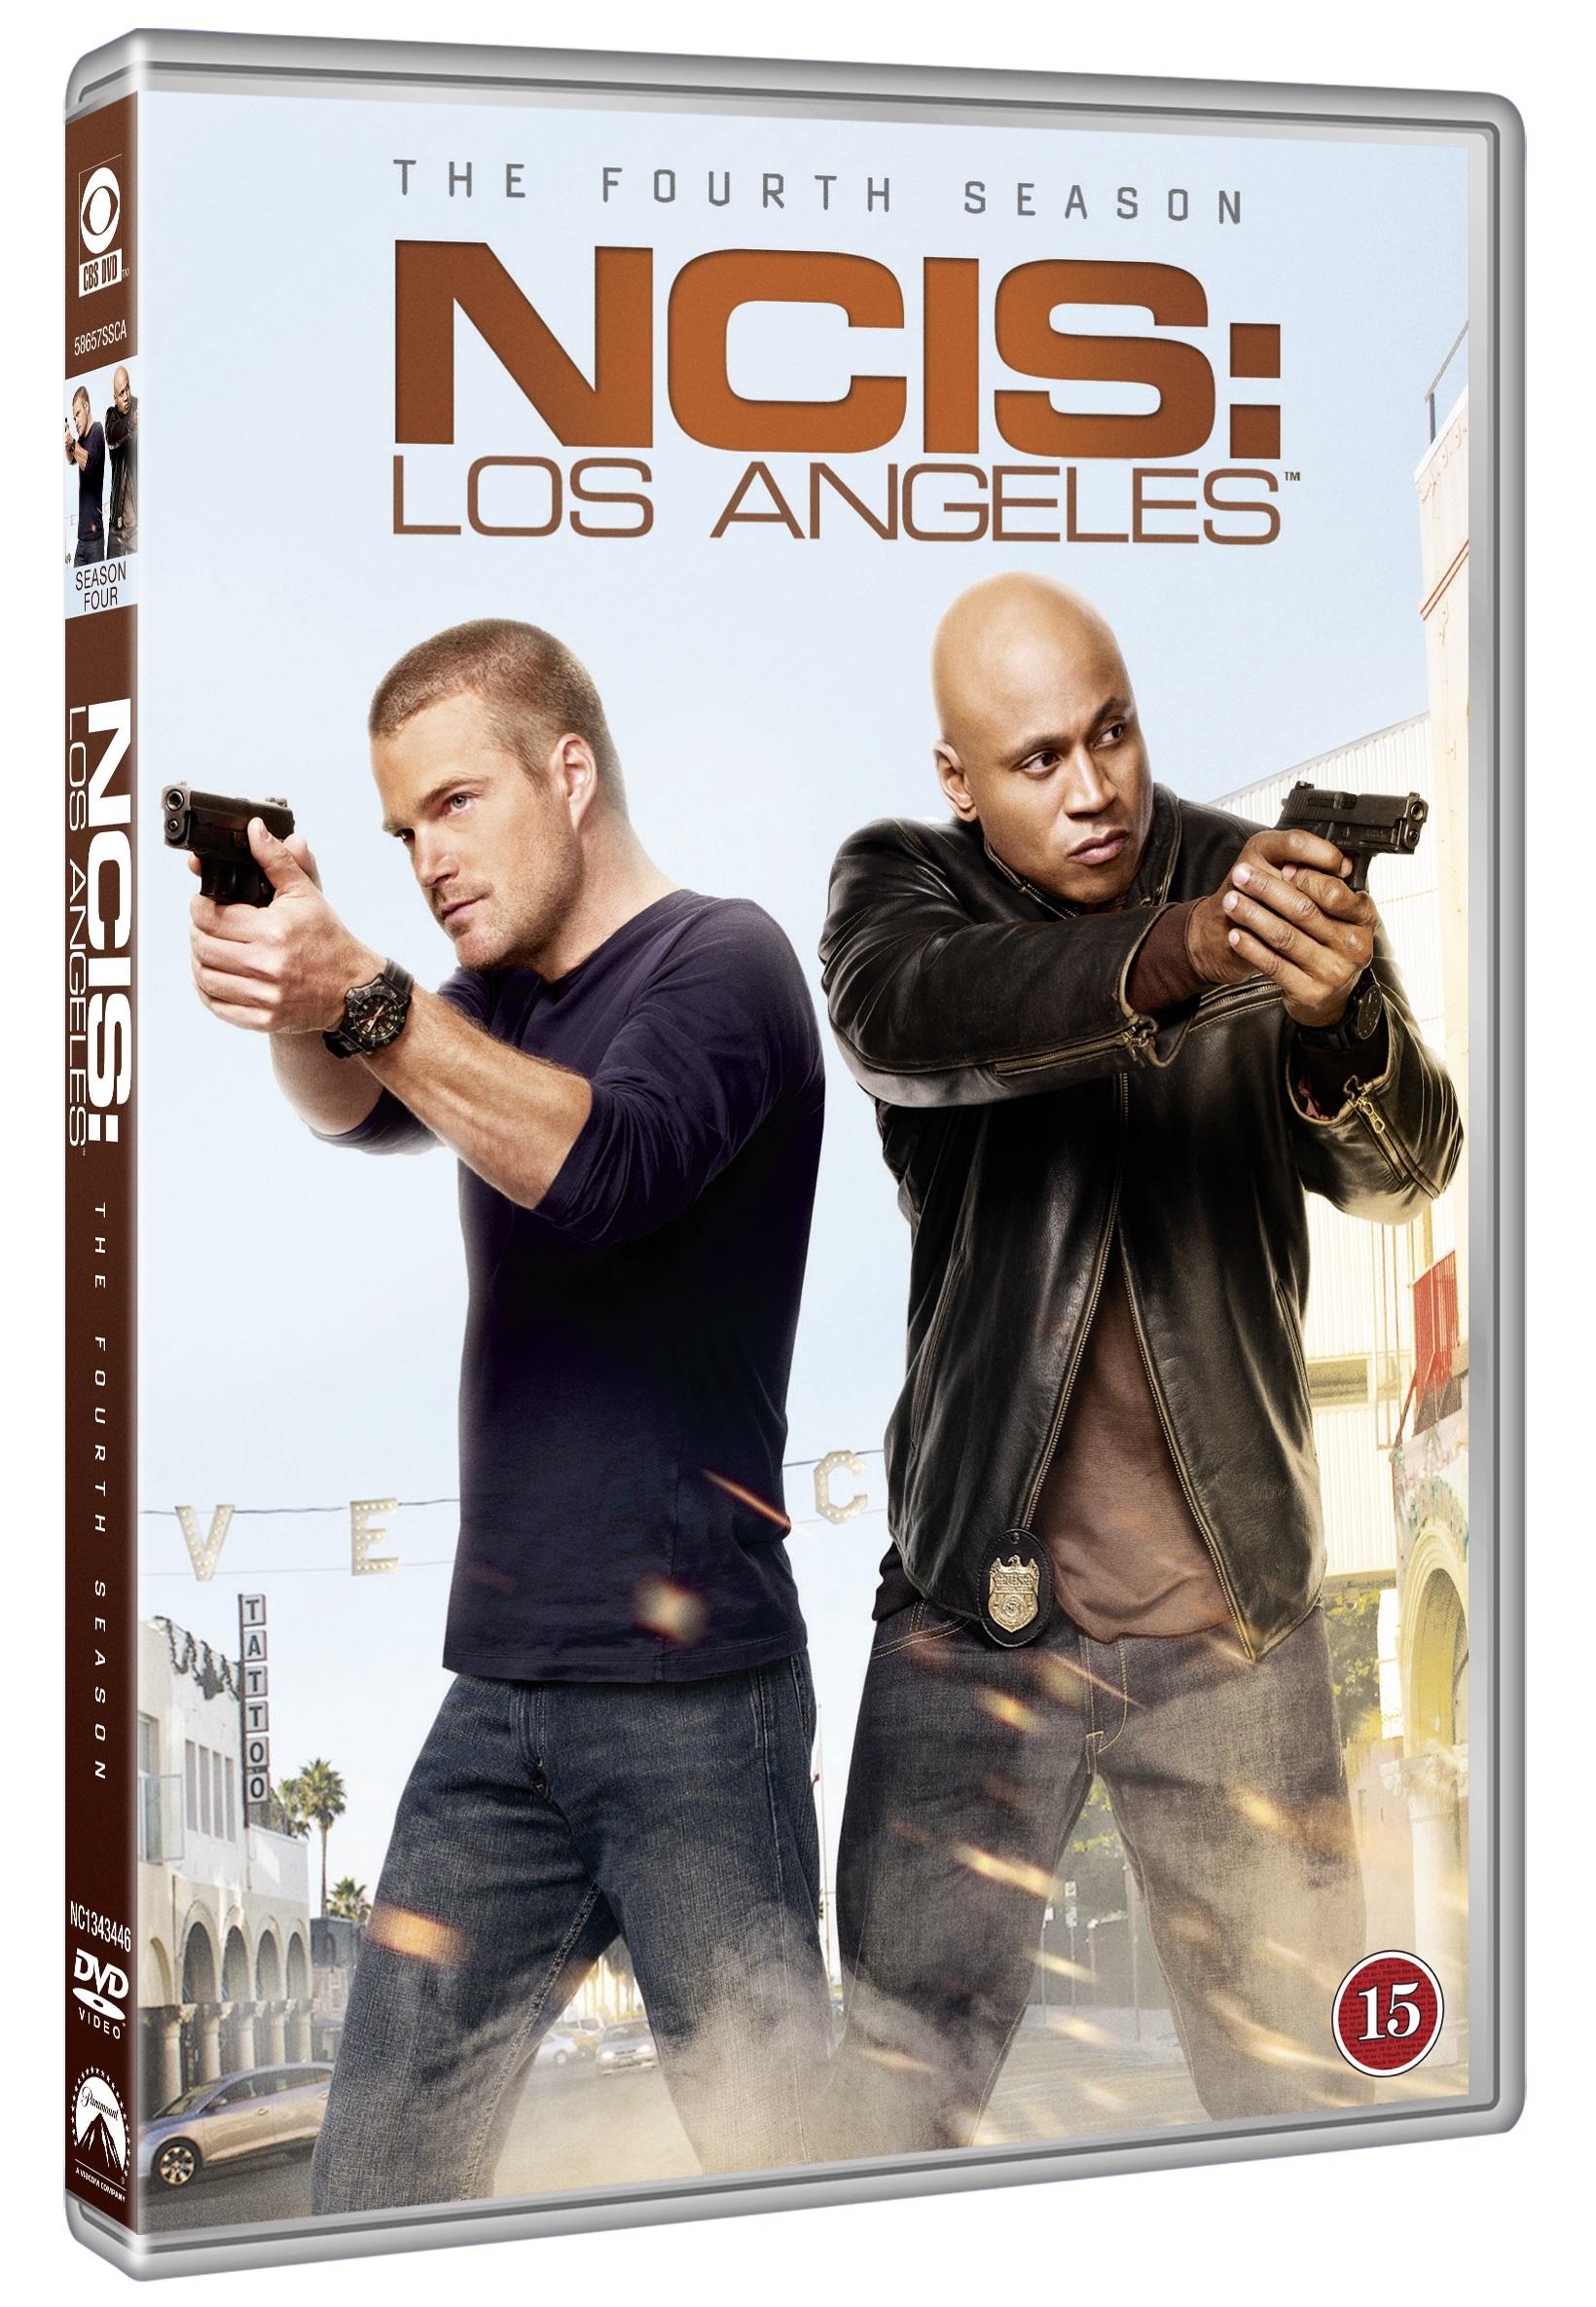 NCIS: Los Angeles - Sæson 4 -  - Film -  - 7332431040823 - 27/3-2014